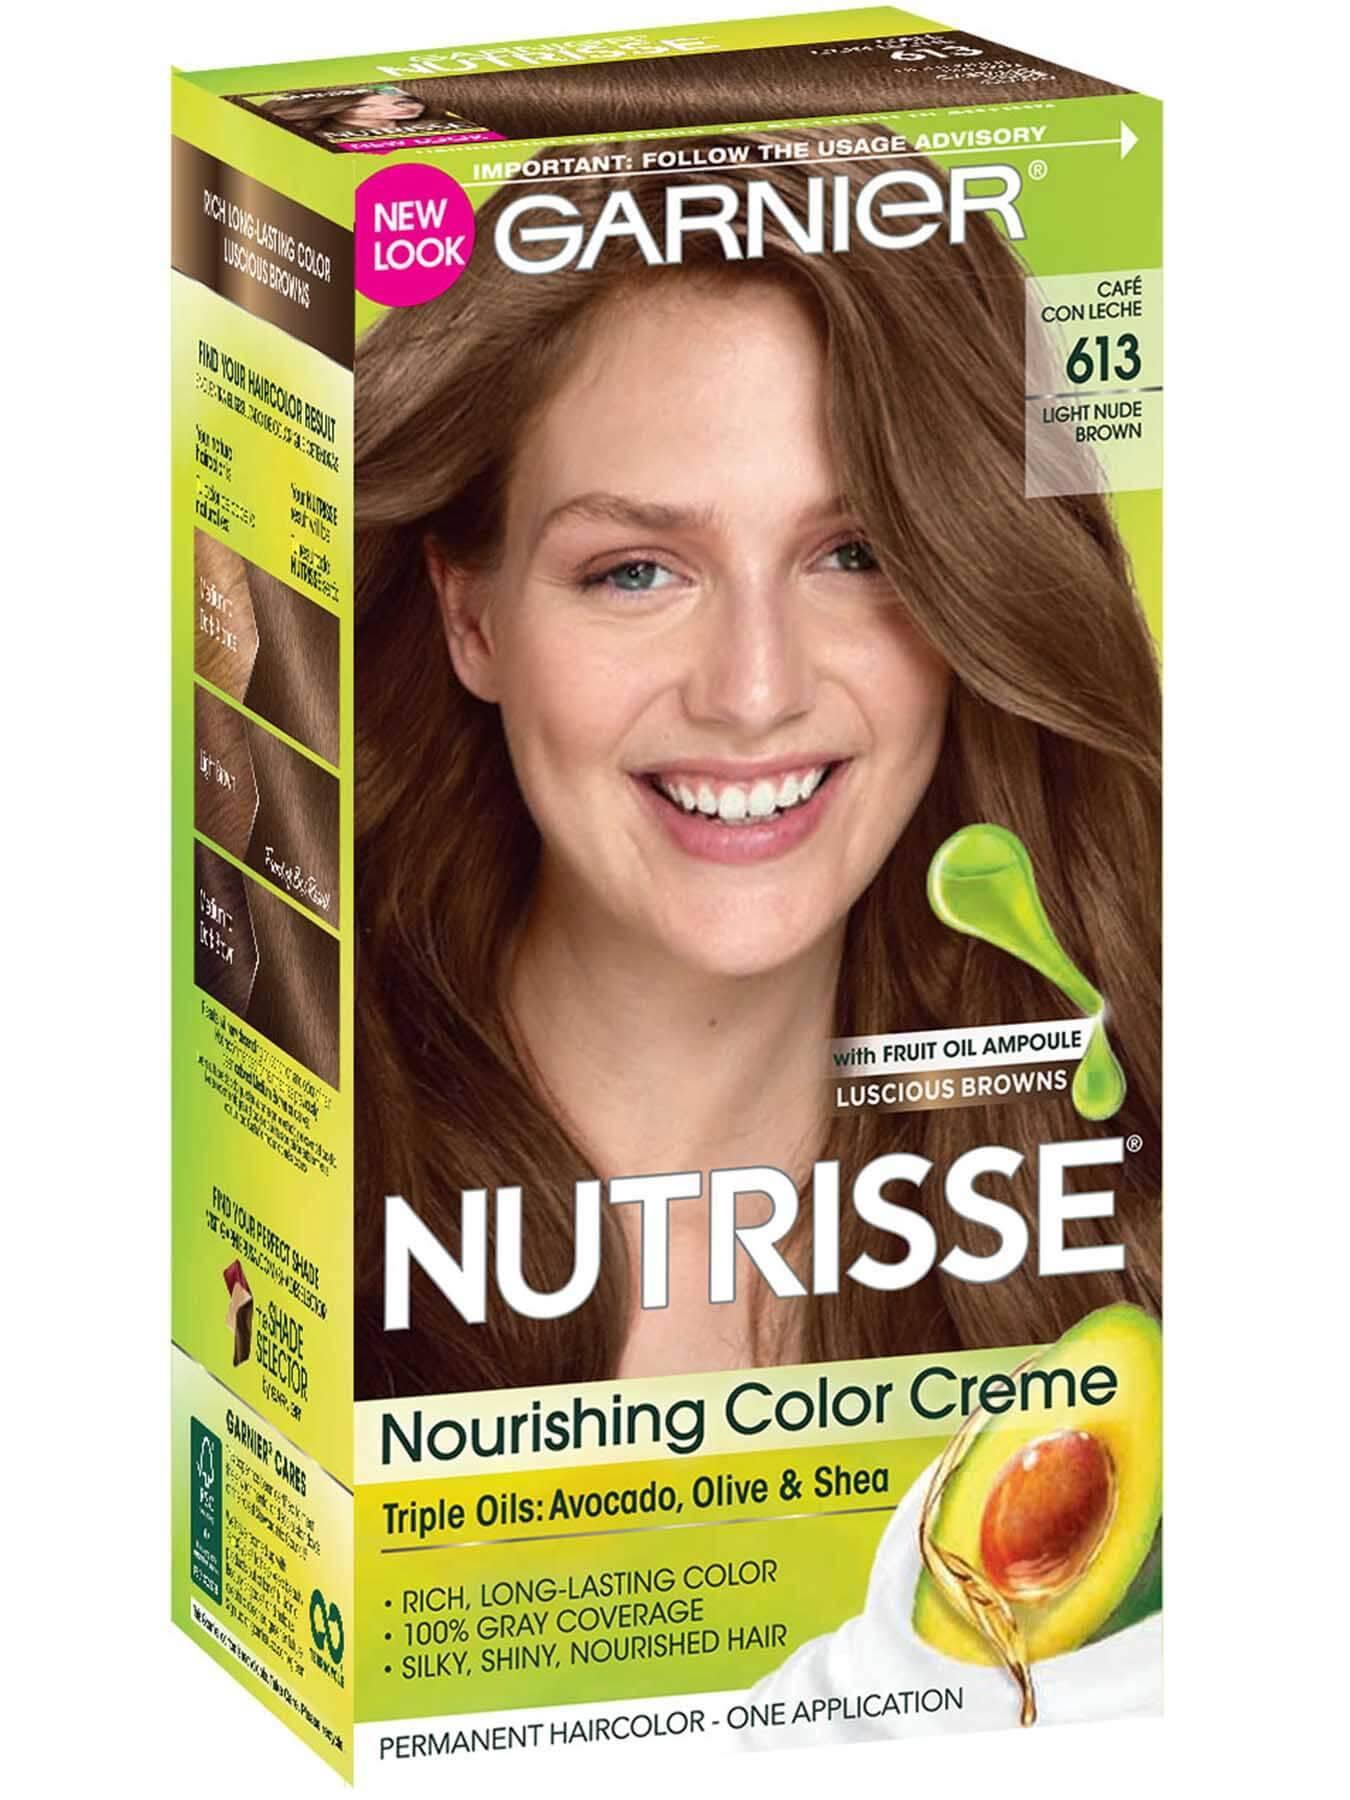 Nutrisse Color Creme Light Nude Brown Hair Color Garnier